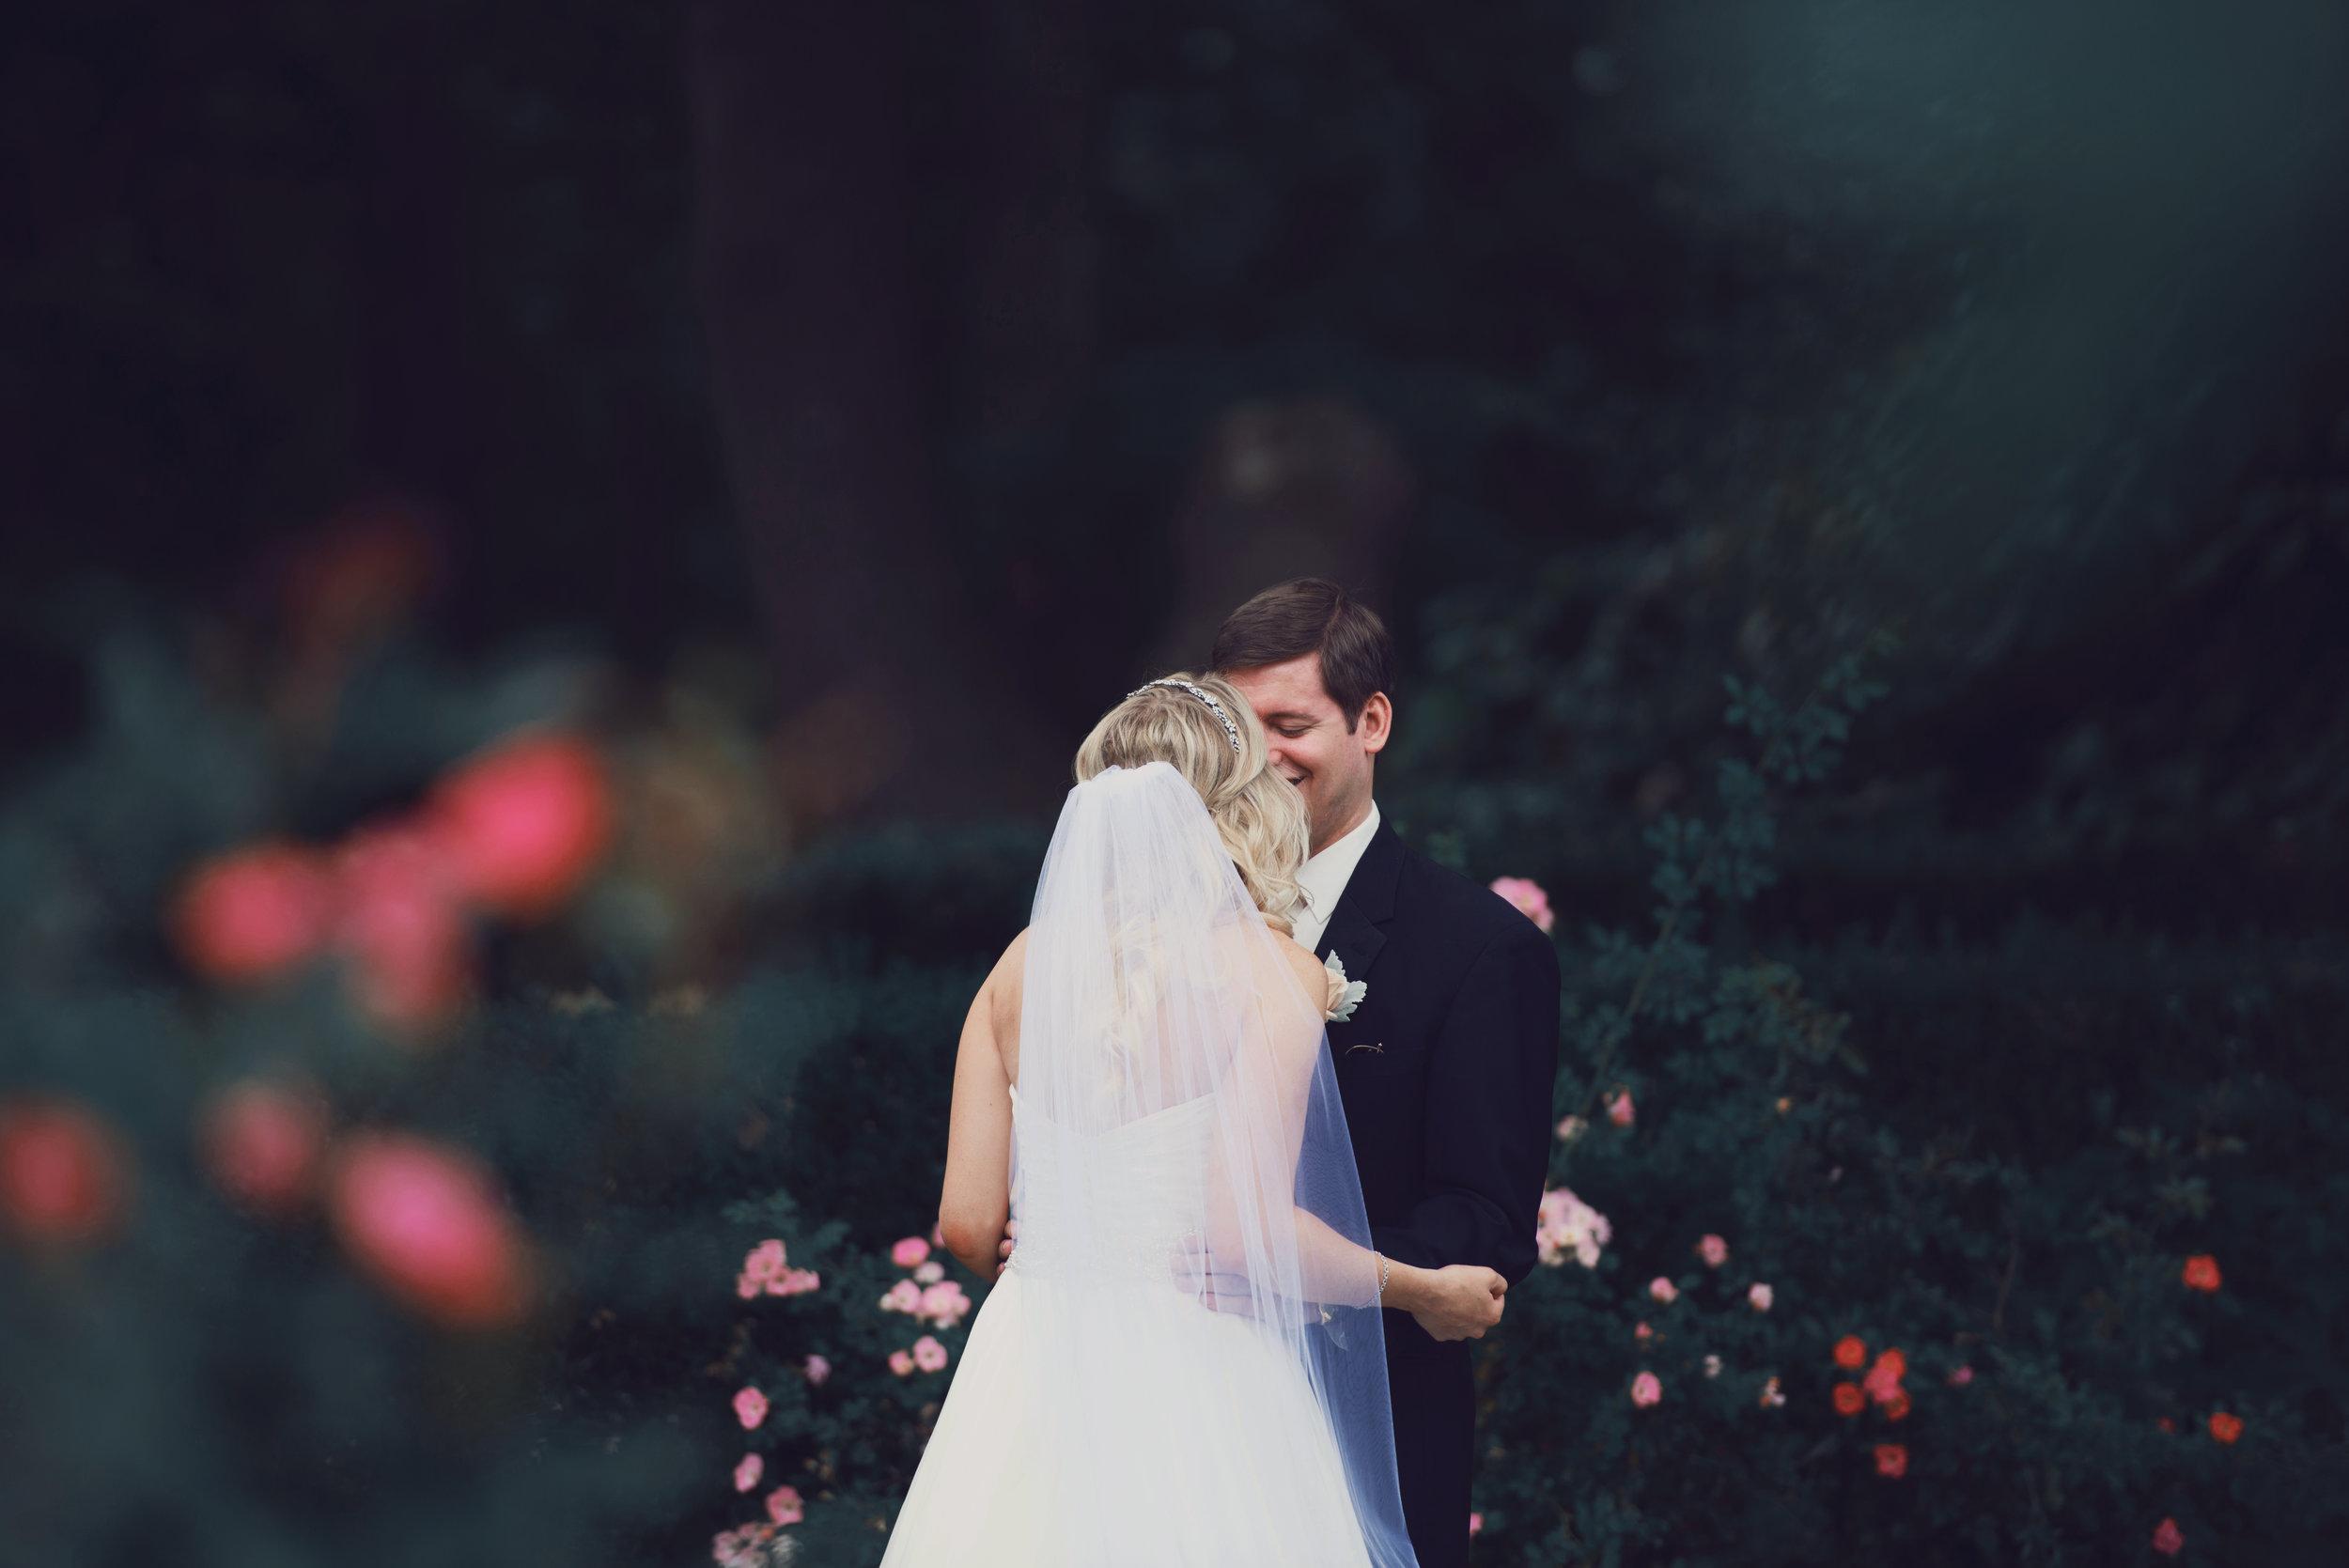 Wedding First Look Photos00943.jpg